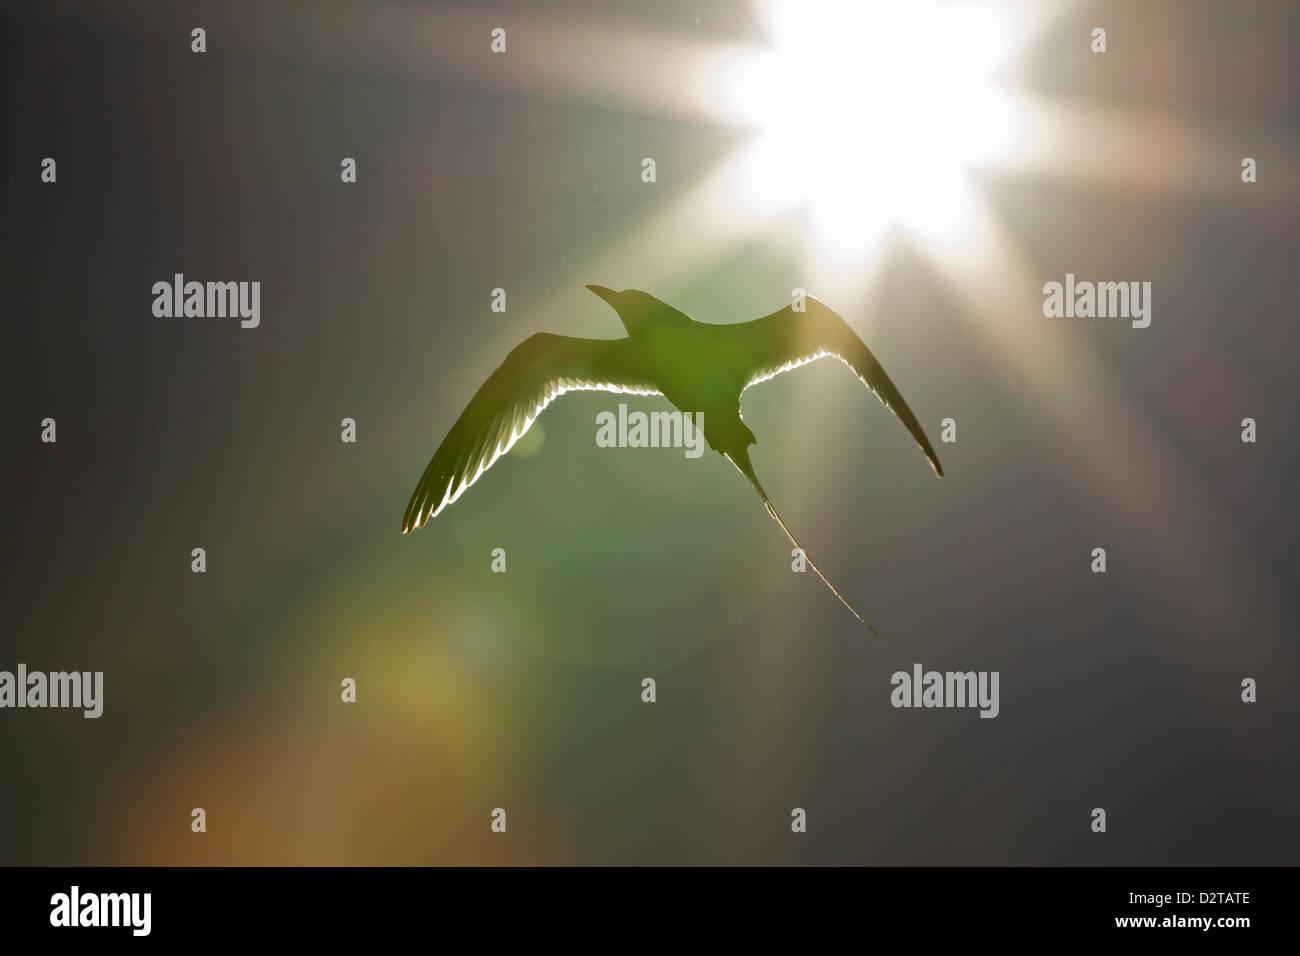 Adult red-billed tropicbird, Isla San Pedro Martir, Gulf of California (Sea of Cortez), Baja California, Mexico - Stock Image